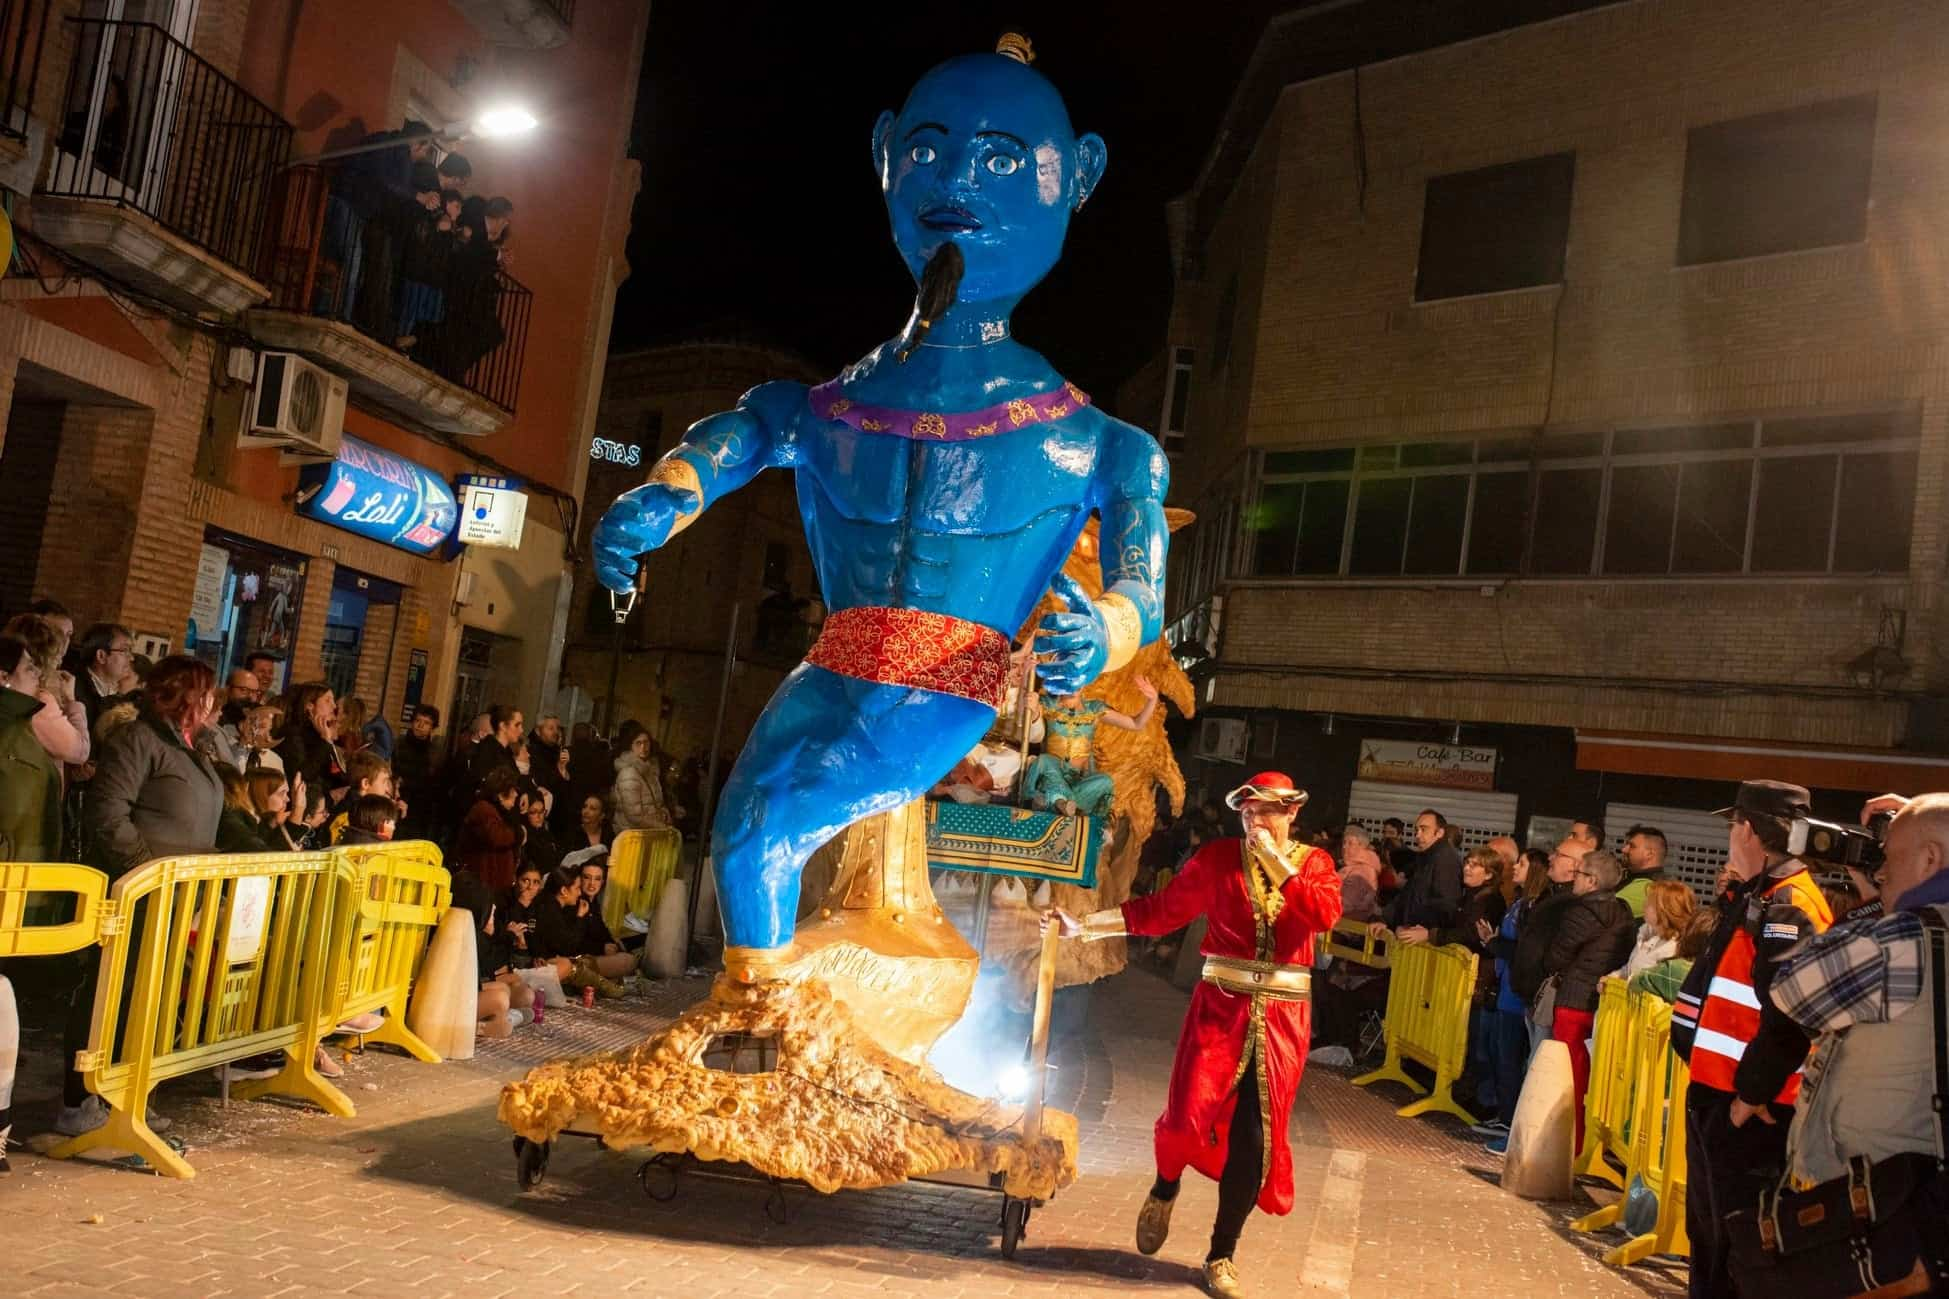 Carnaval de herencia 2020 ofertorio 117 - Selección de fotografías del Ofertorio del Carnaval de Herencia